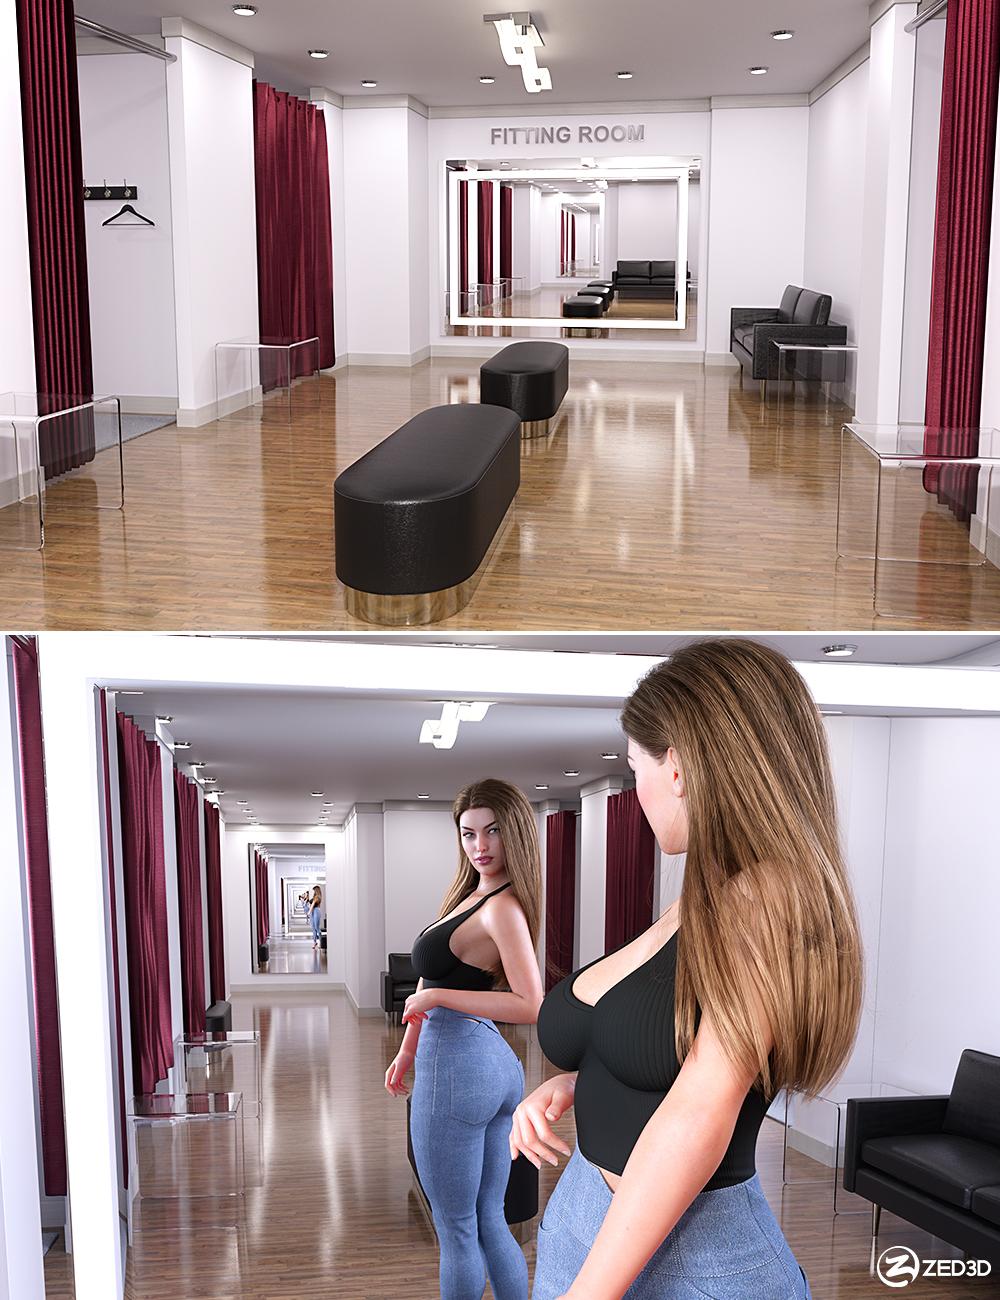 Z Fitting Room Environment by: Zeddicuss, 3D Models by Daz 3D